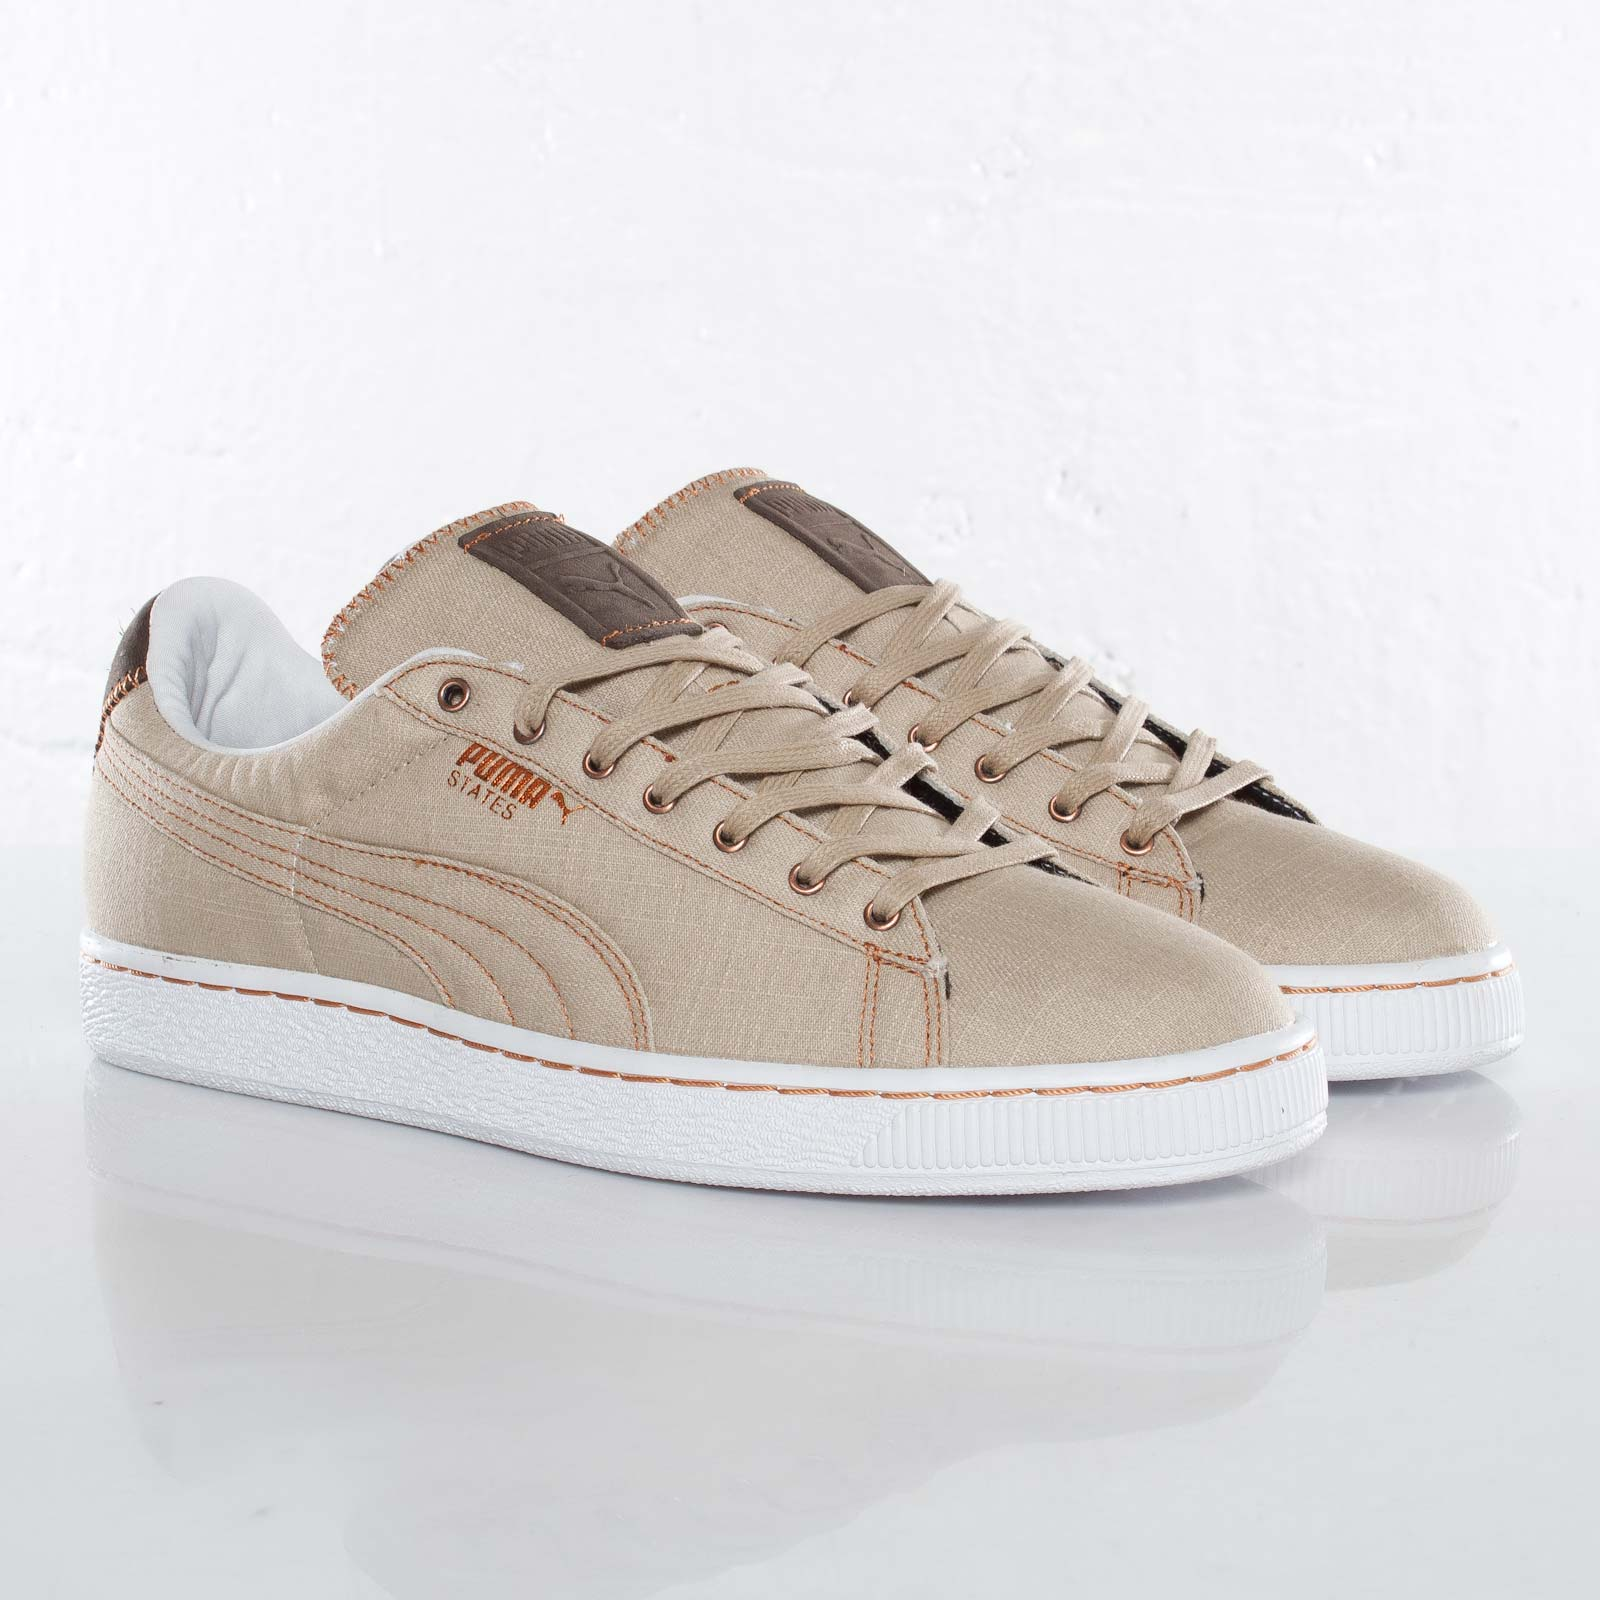 7eaea902b19d Puma States x Denim - 354770-03 - Sneakersnstuff